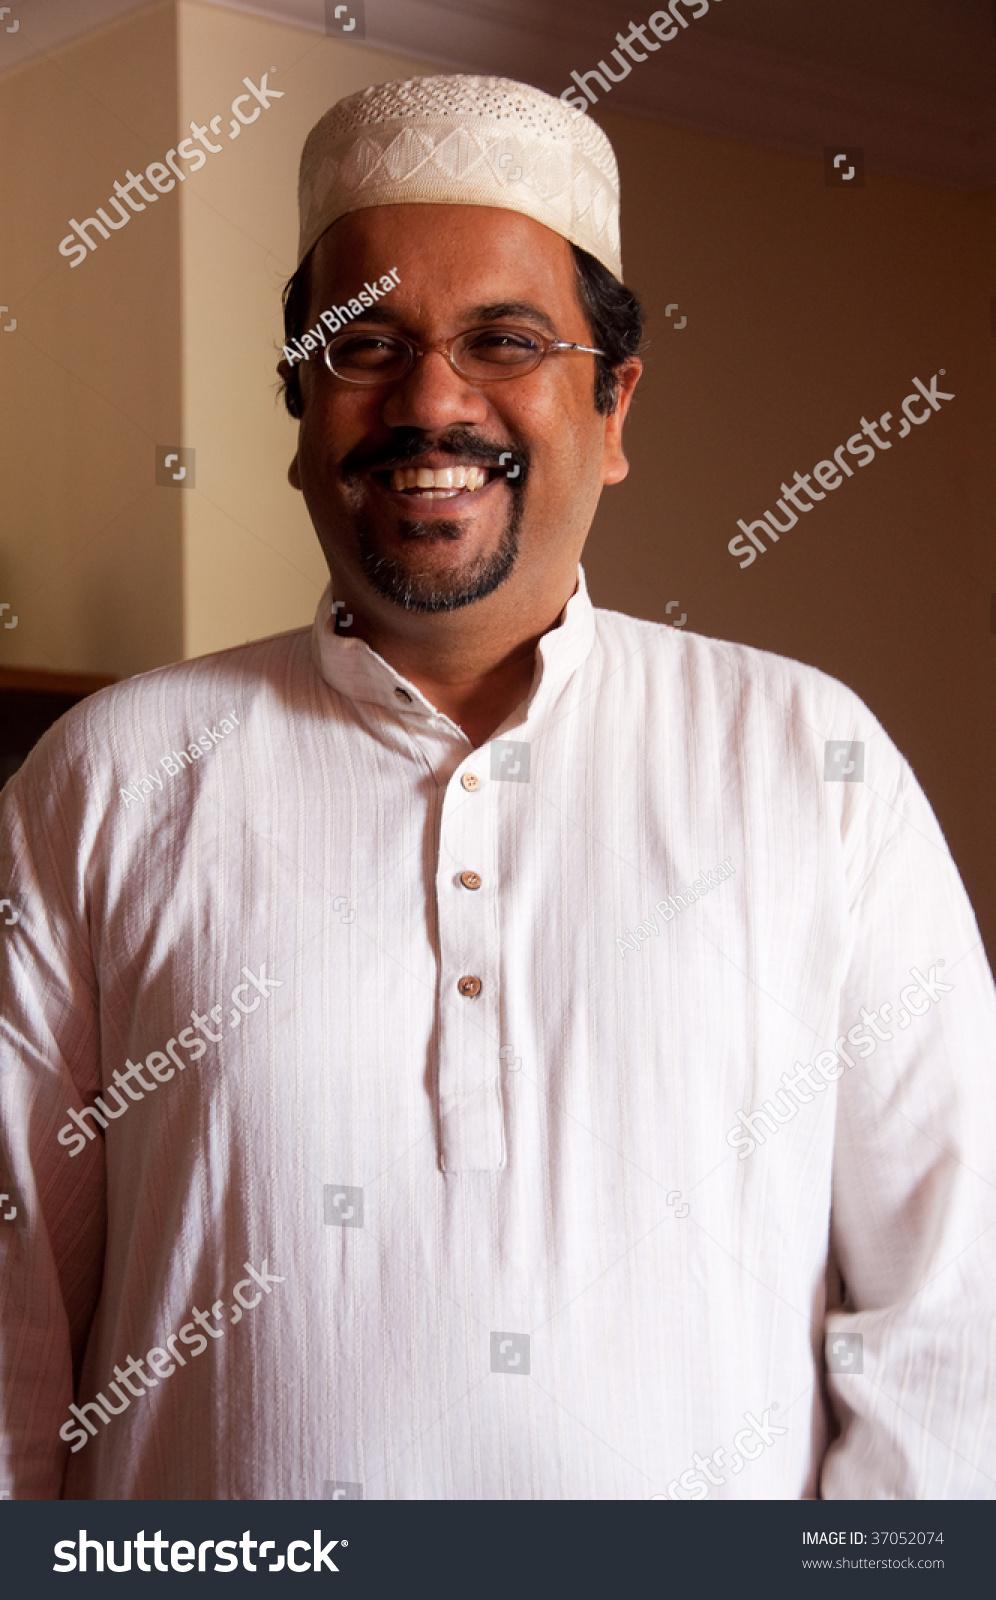 muslim dating in usa